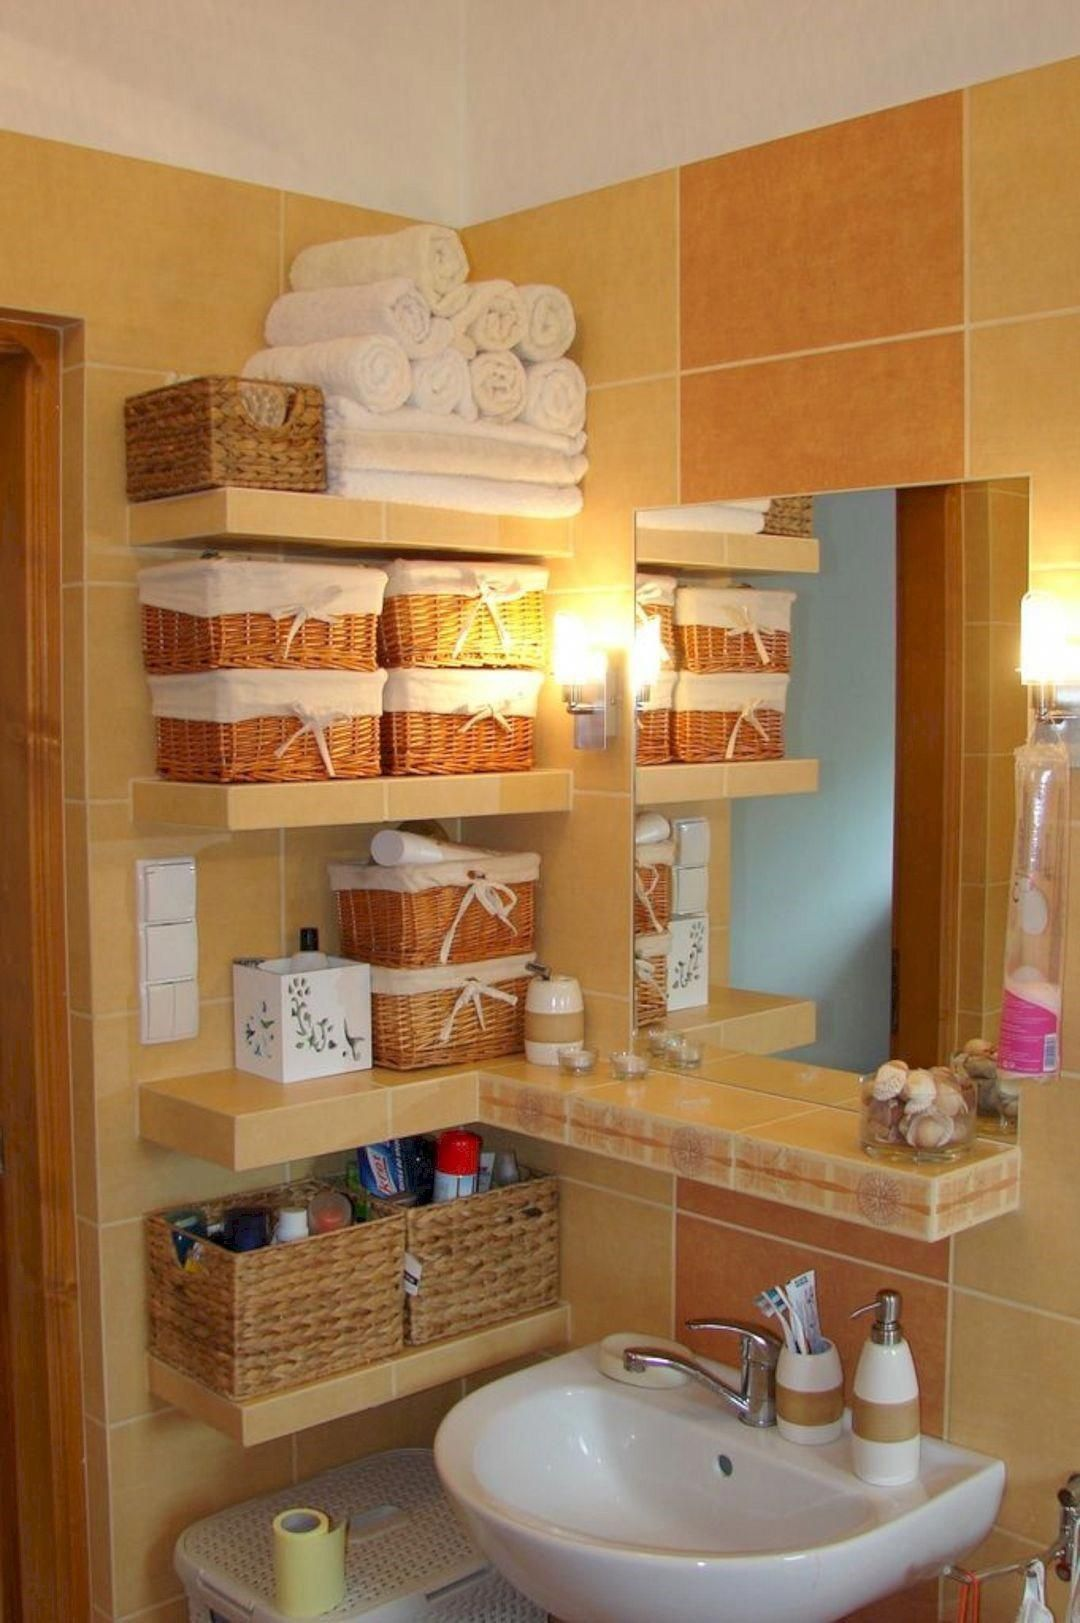 29 Space Efficient Bathroom Storage Ideas That Look Beautiful Small Bathroom Vanities Bathroom Design Small Small Bathroom